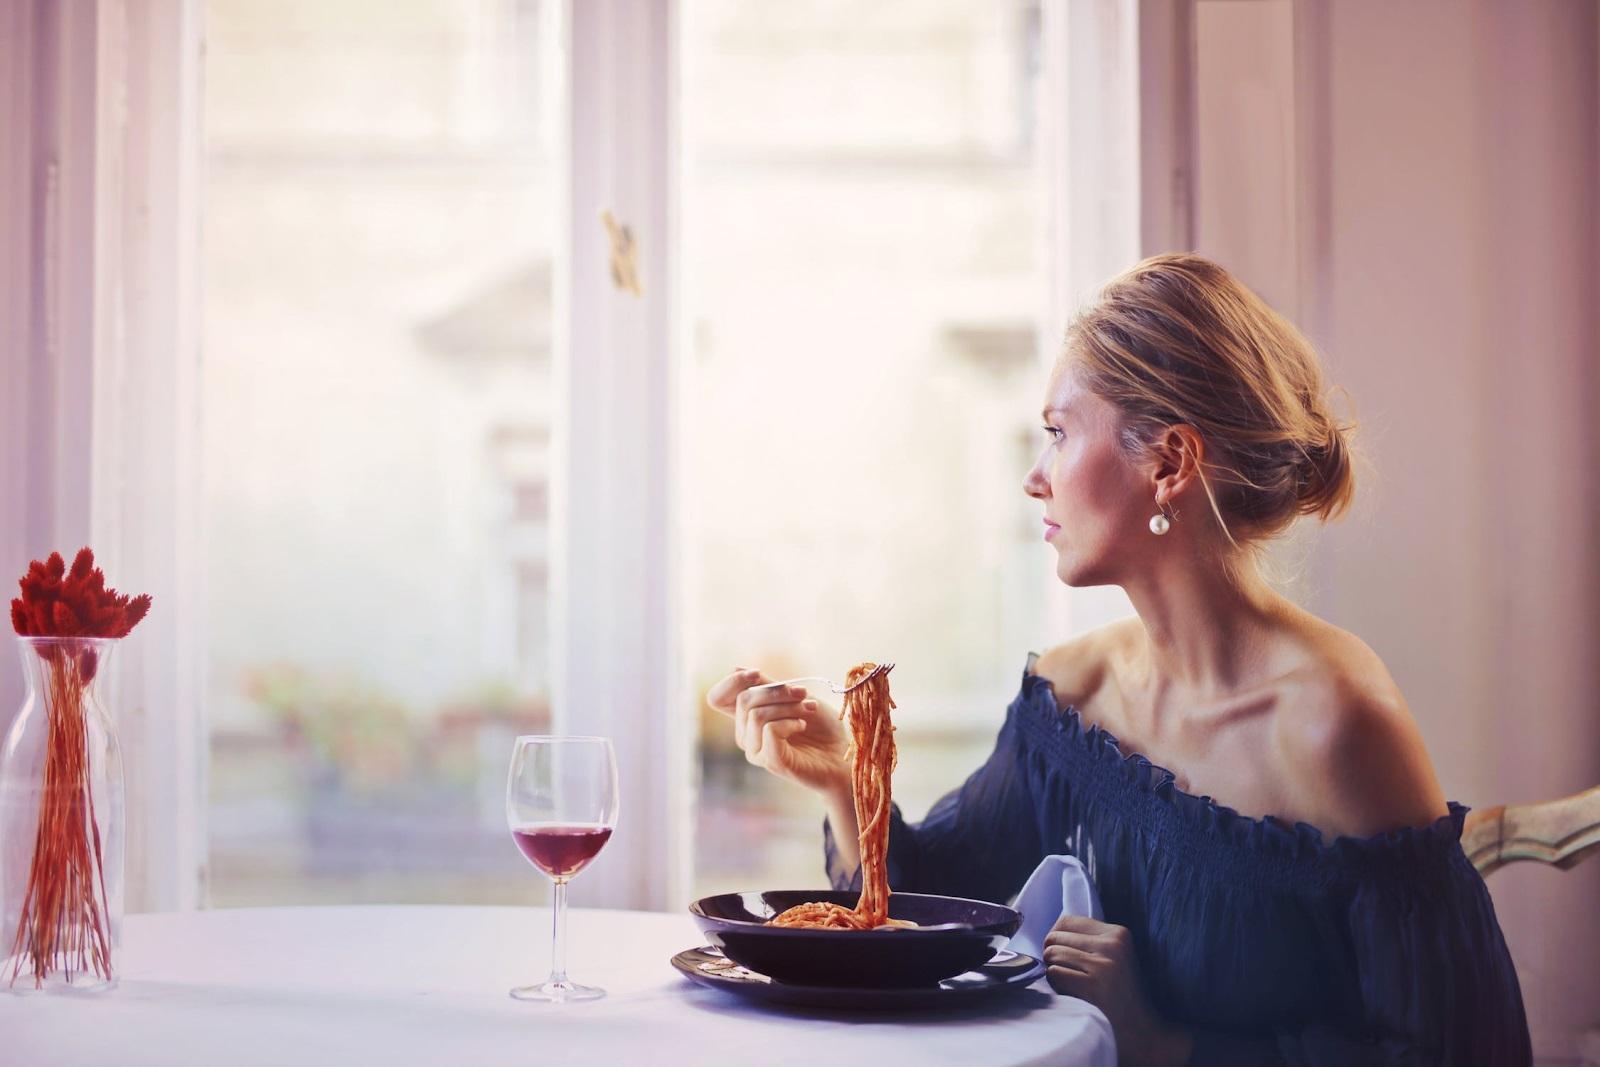 Woman and food